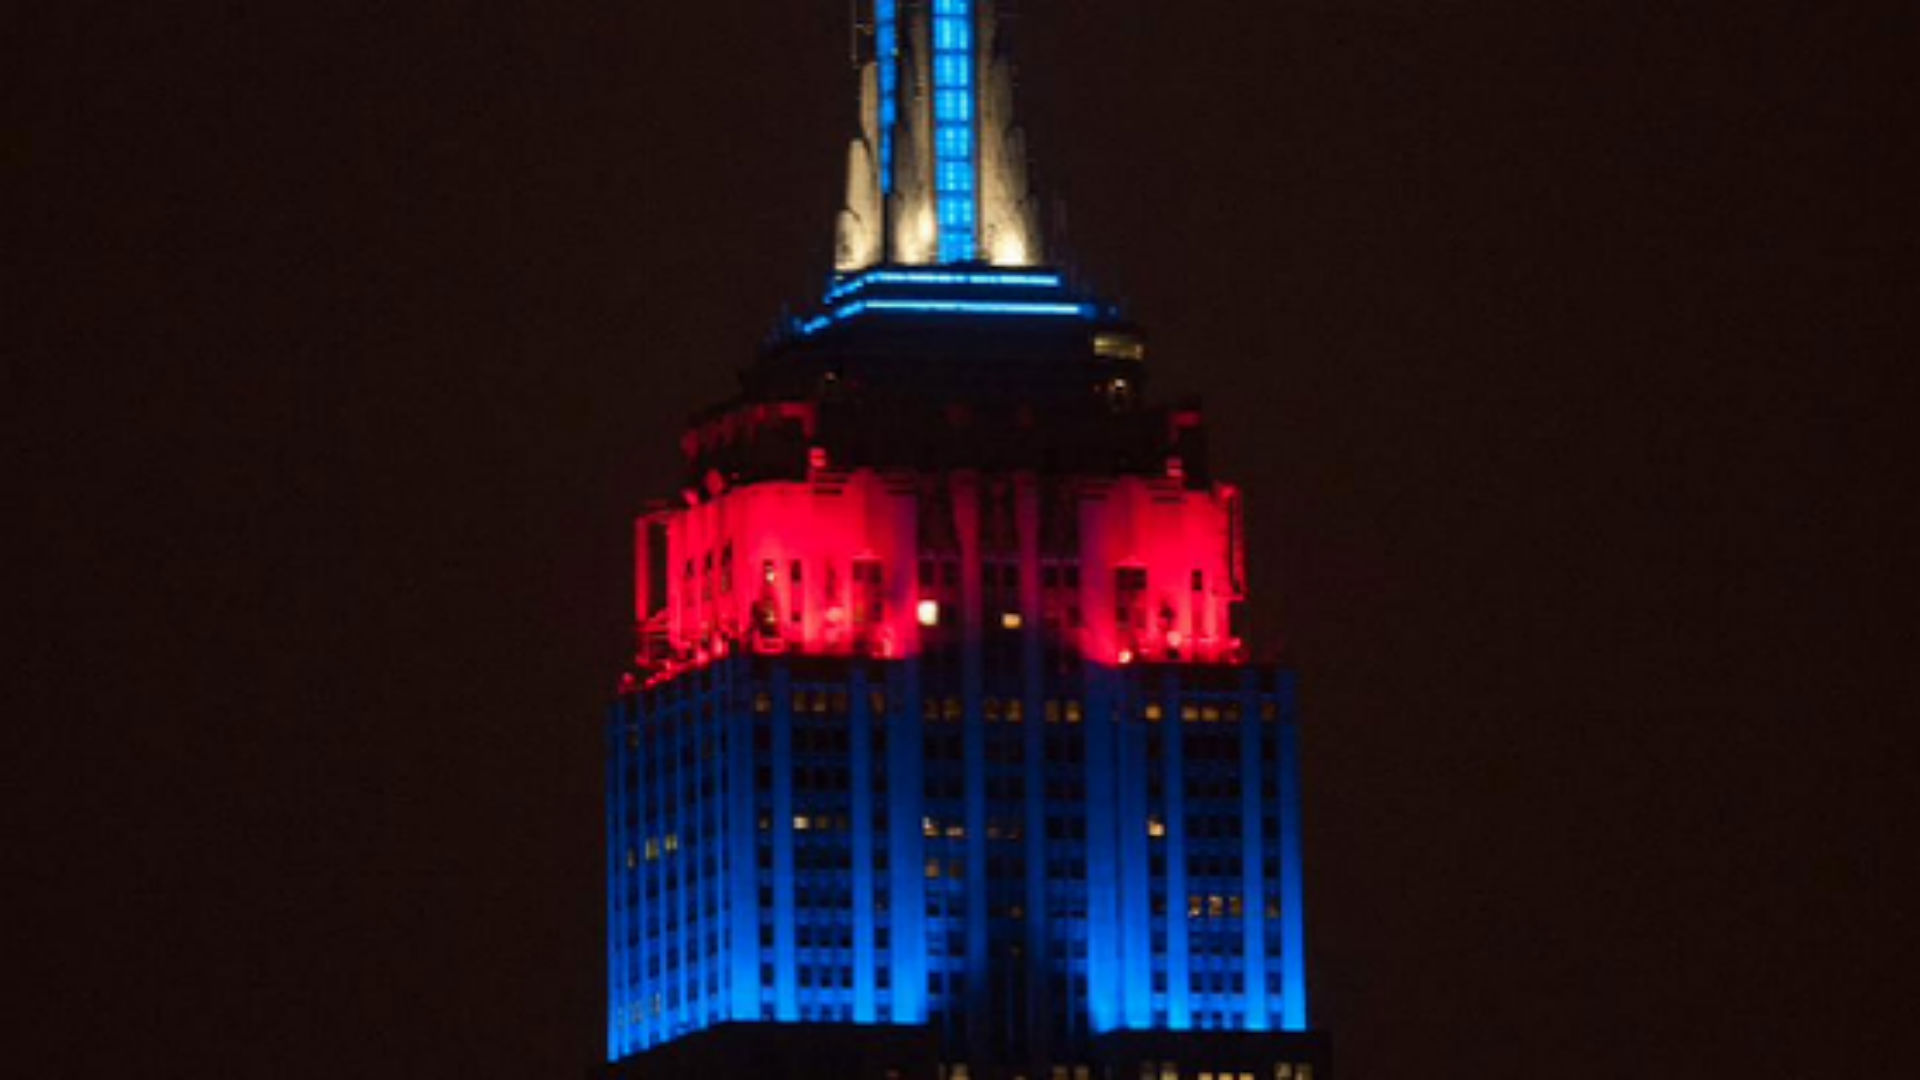 Cool Wallpaper Night Empire State Building - empire-state-building-ftr-2215_1tvqsrysiyic71vtuke8lmhgjr  Collection-219992.jpg?t\u003d1258974843